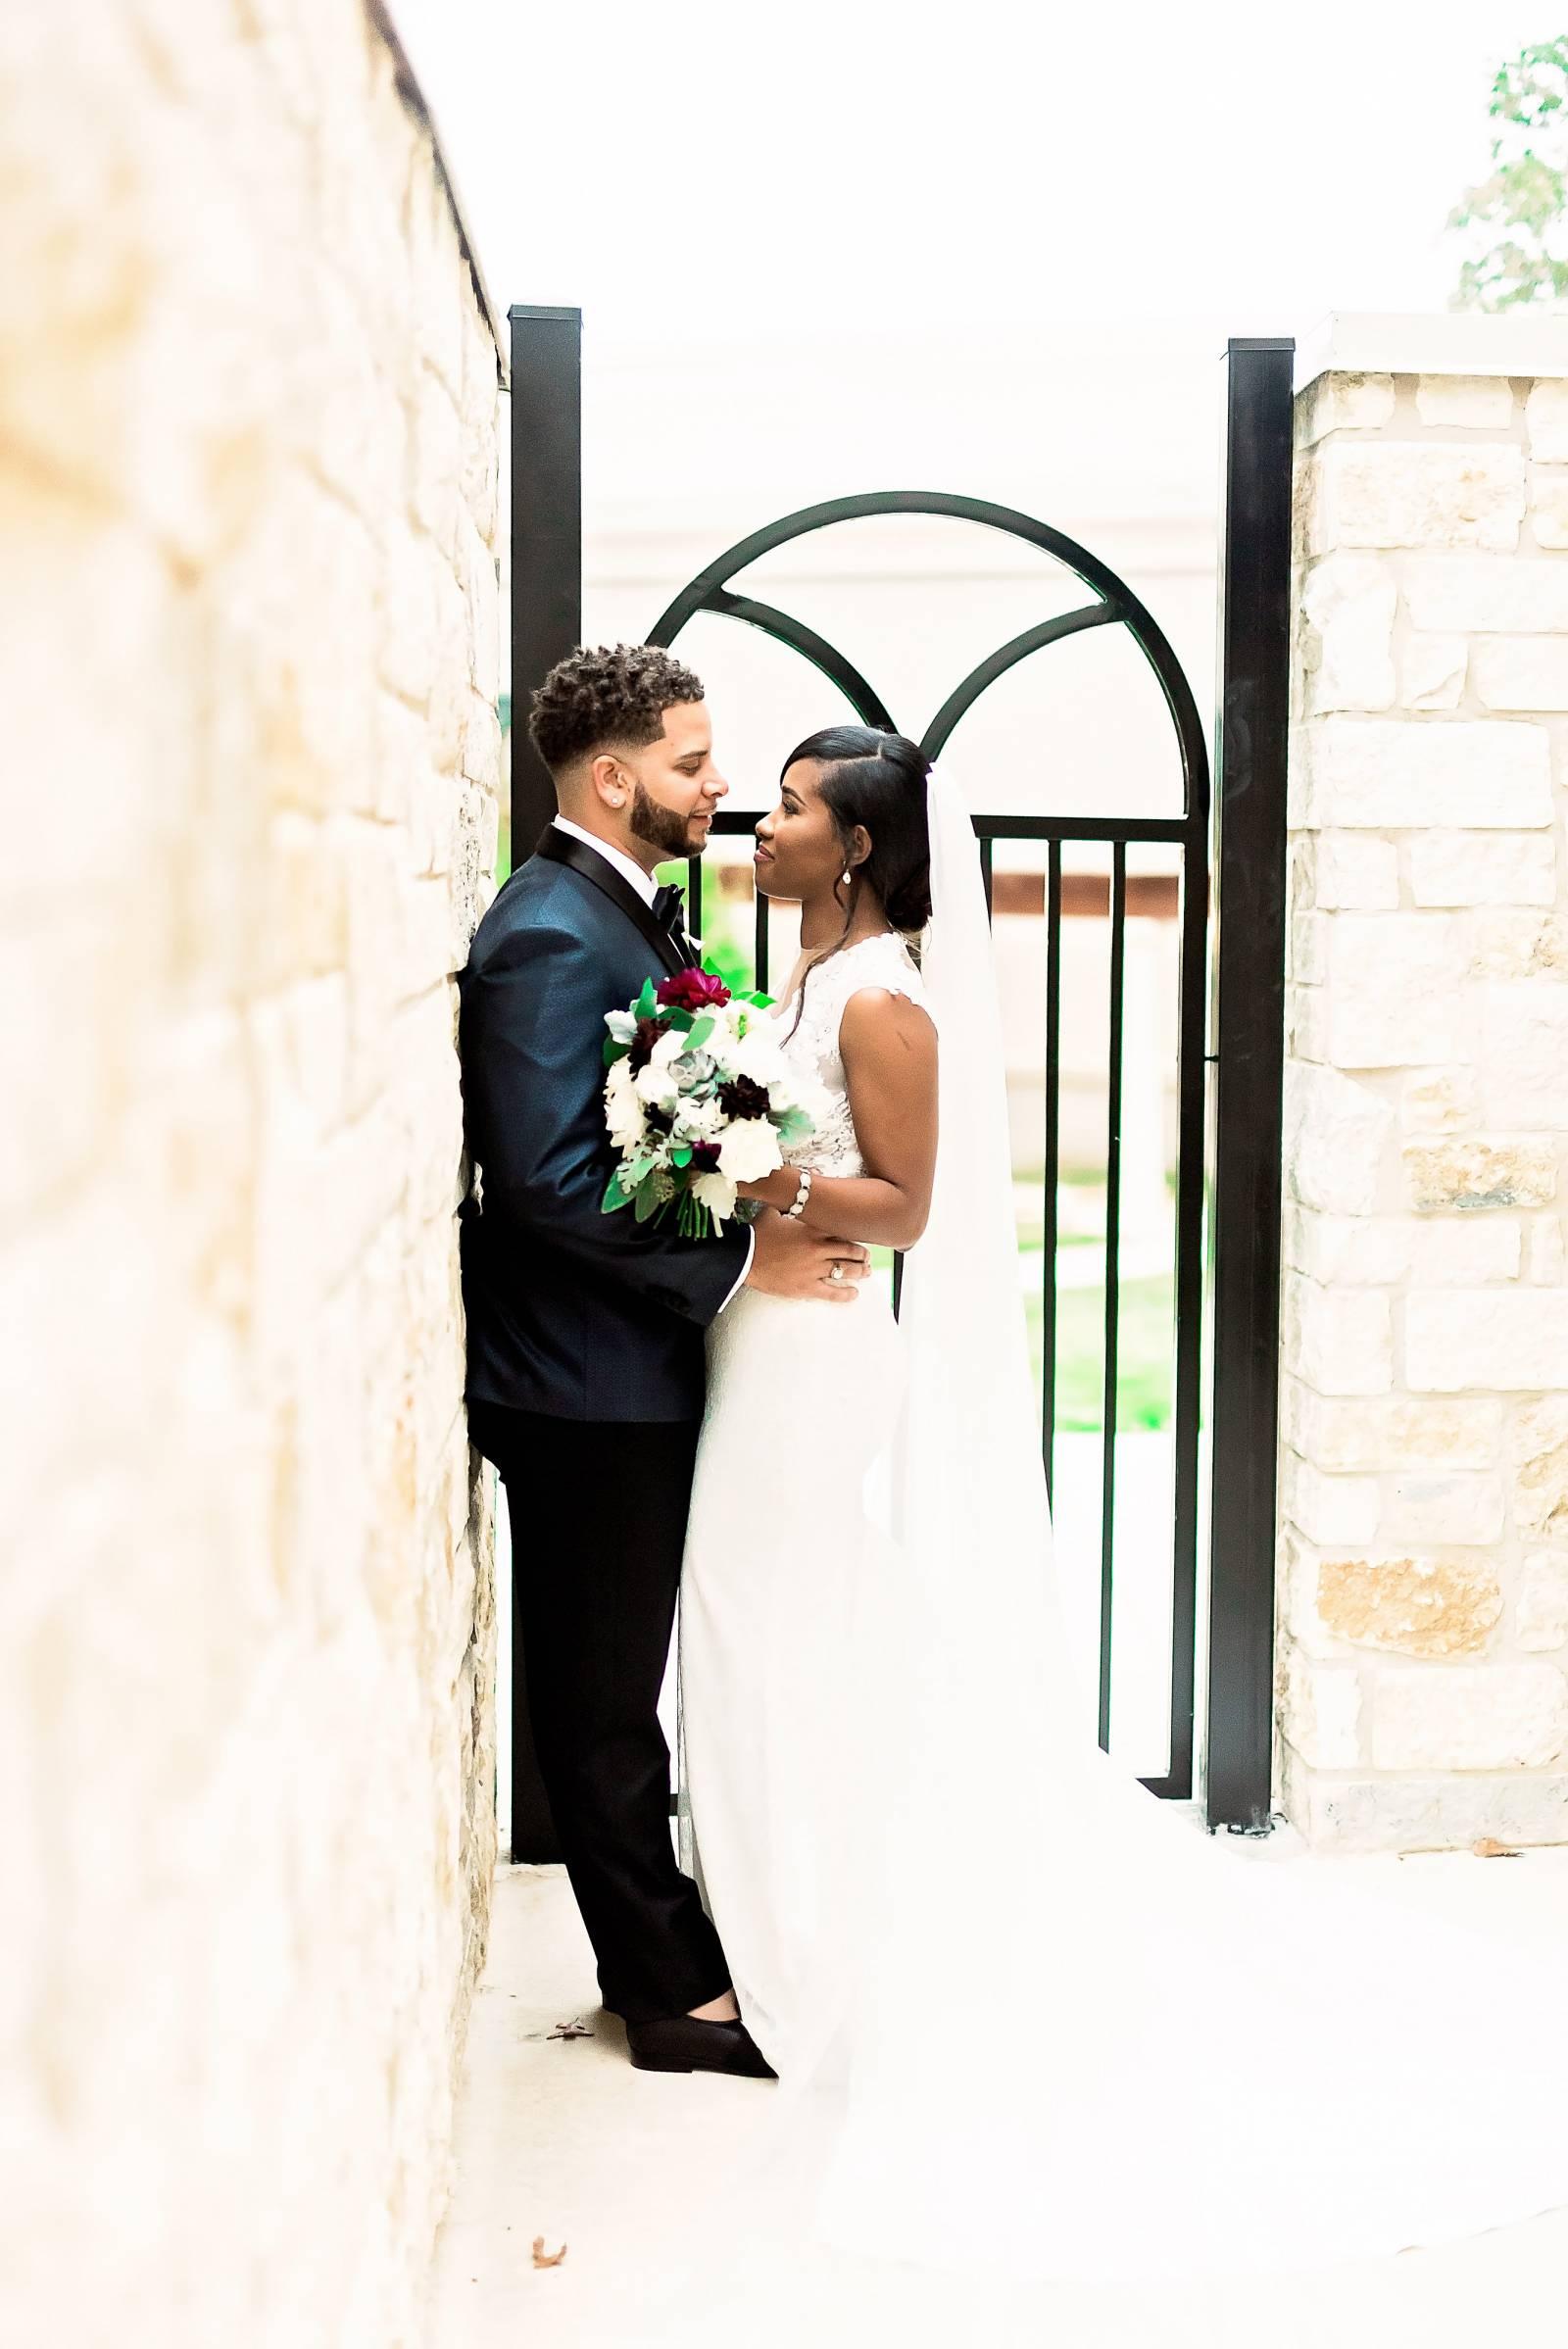 DeShana and Darryl Featured on The Black Bride - 14.jpg